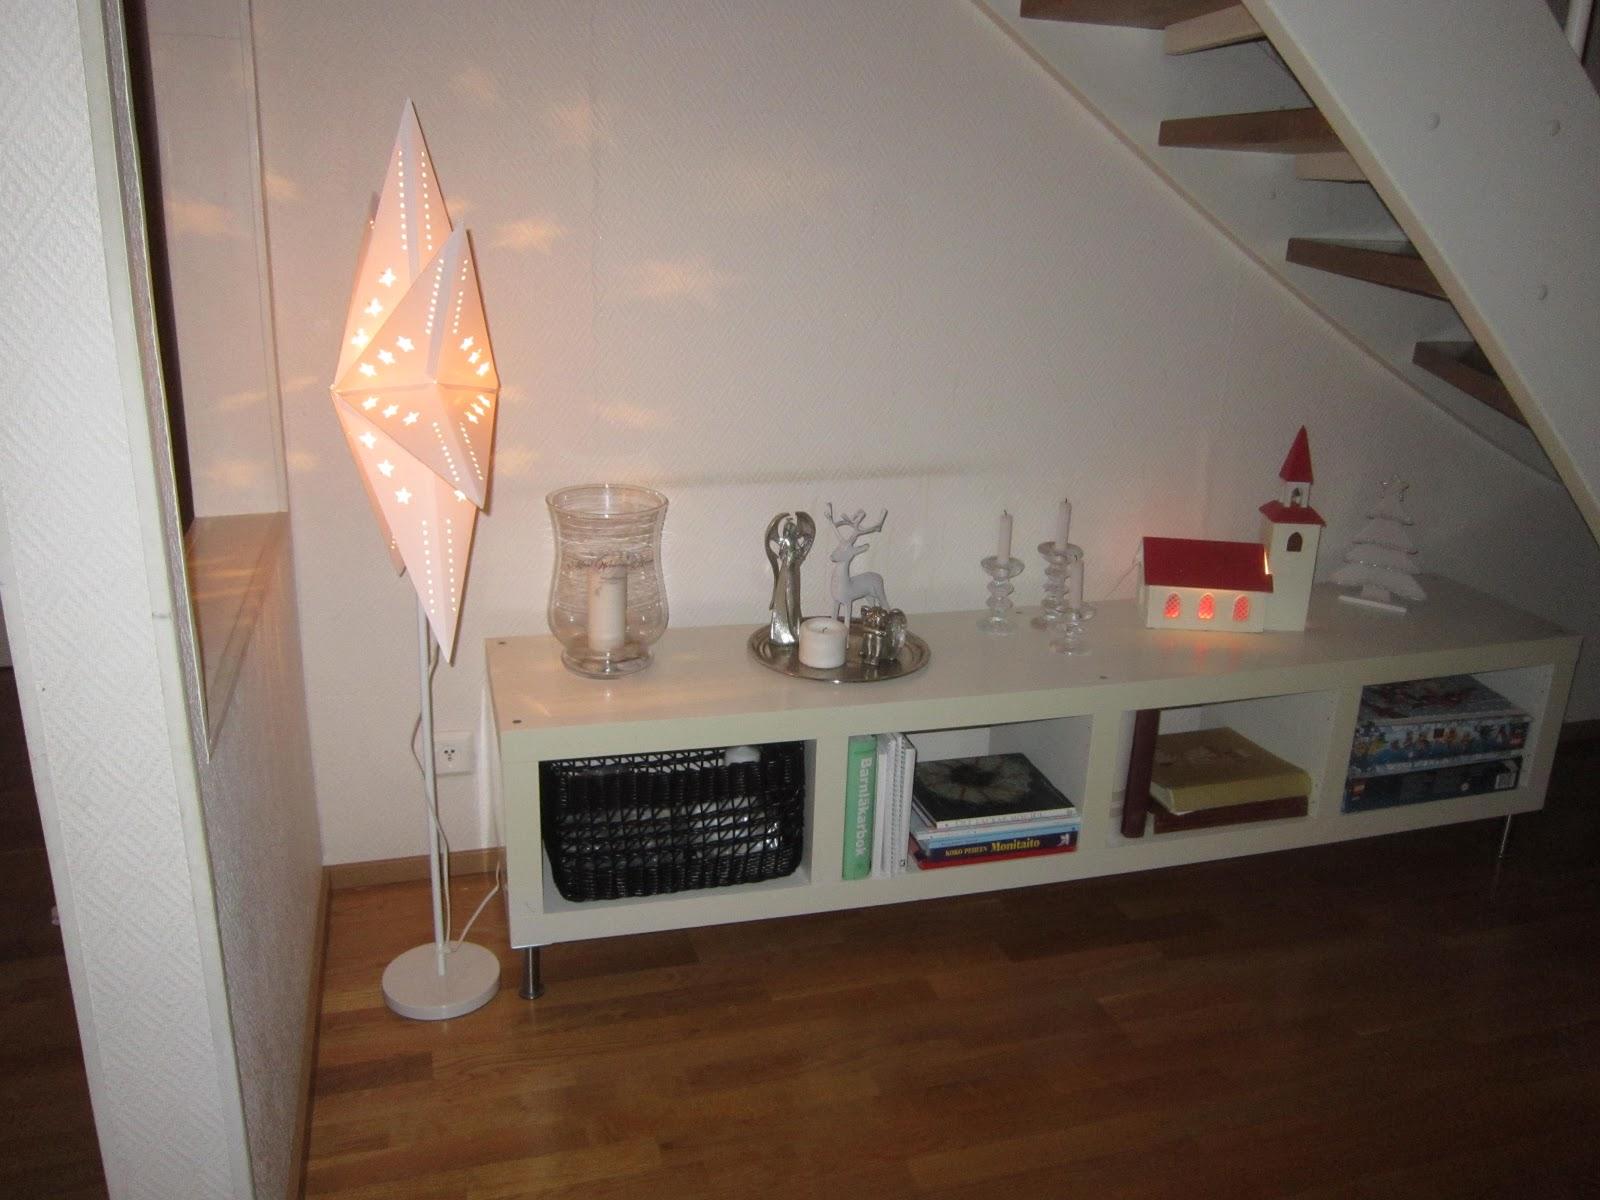 Lindas blogg: jul i vårt hus